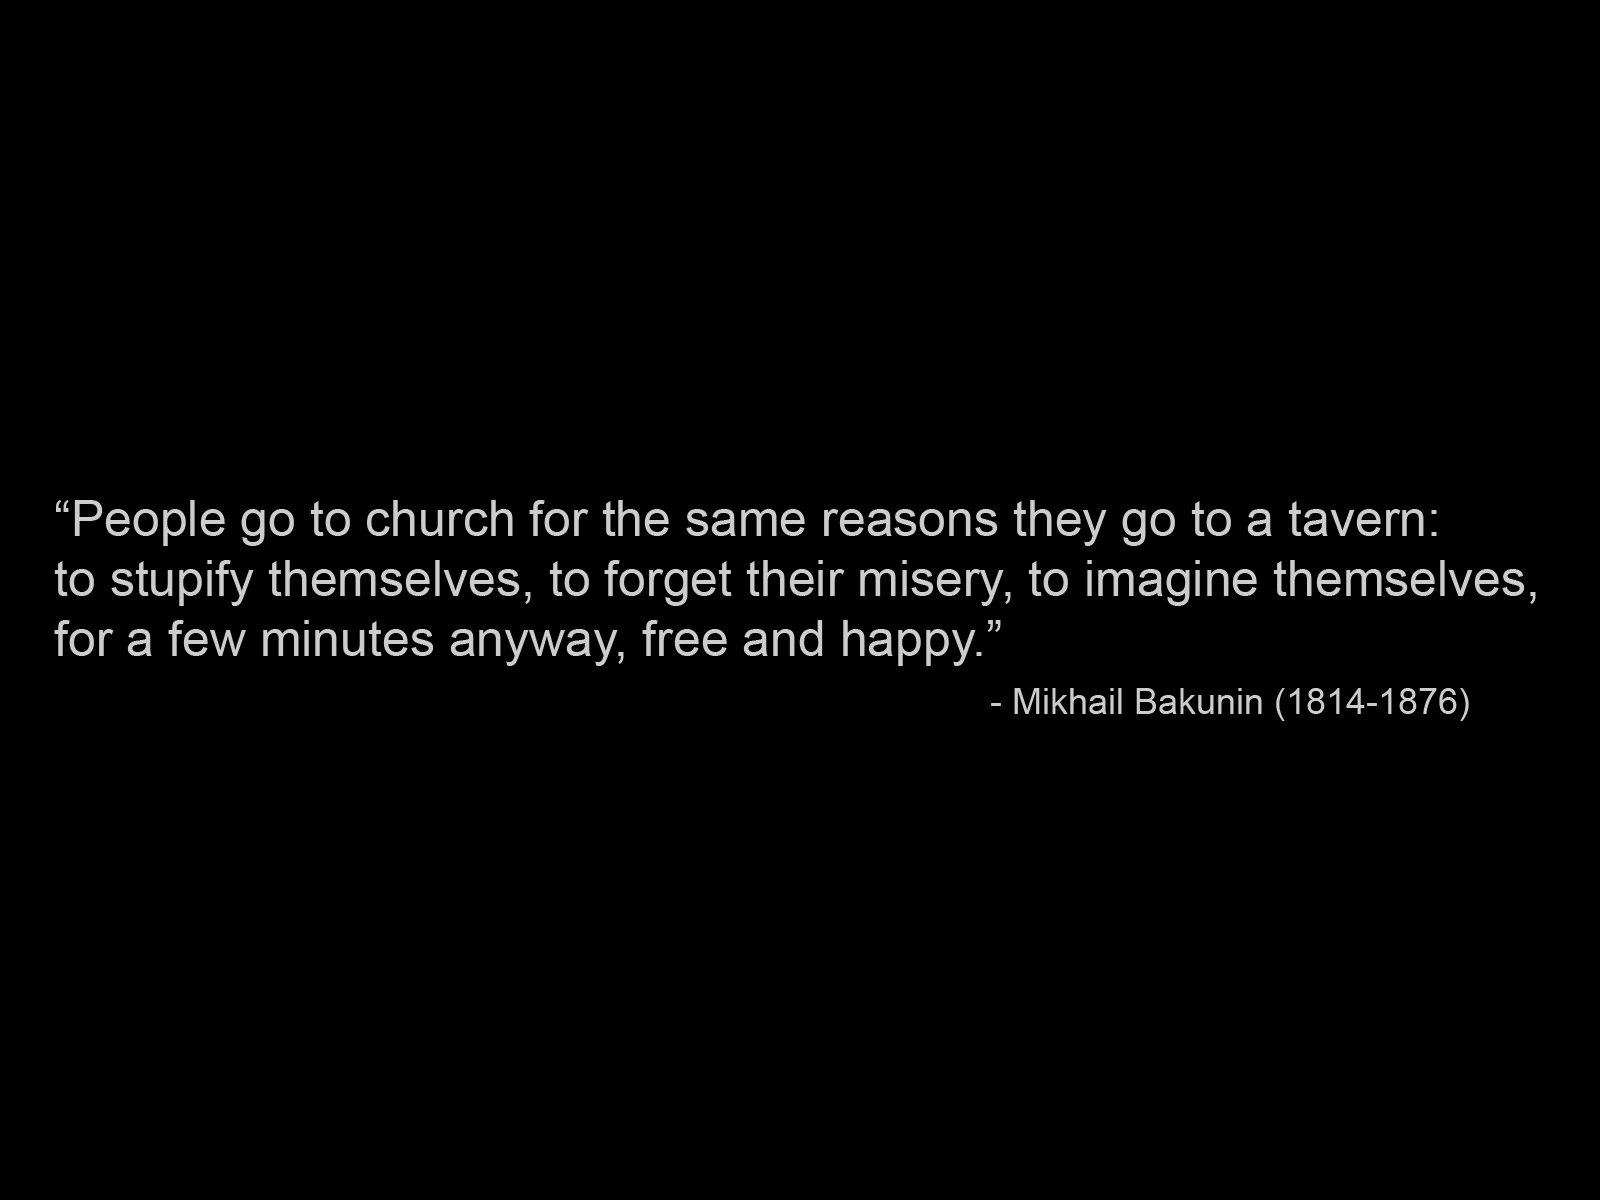 Mikhail Bakunin's quote #6